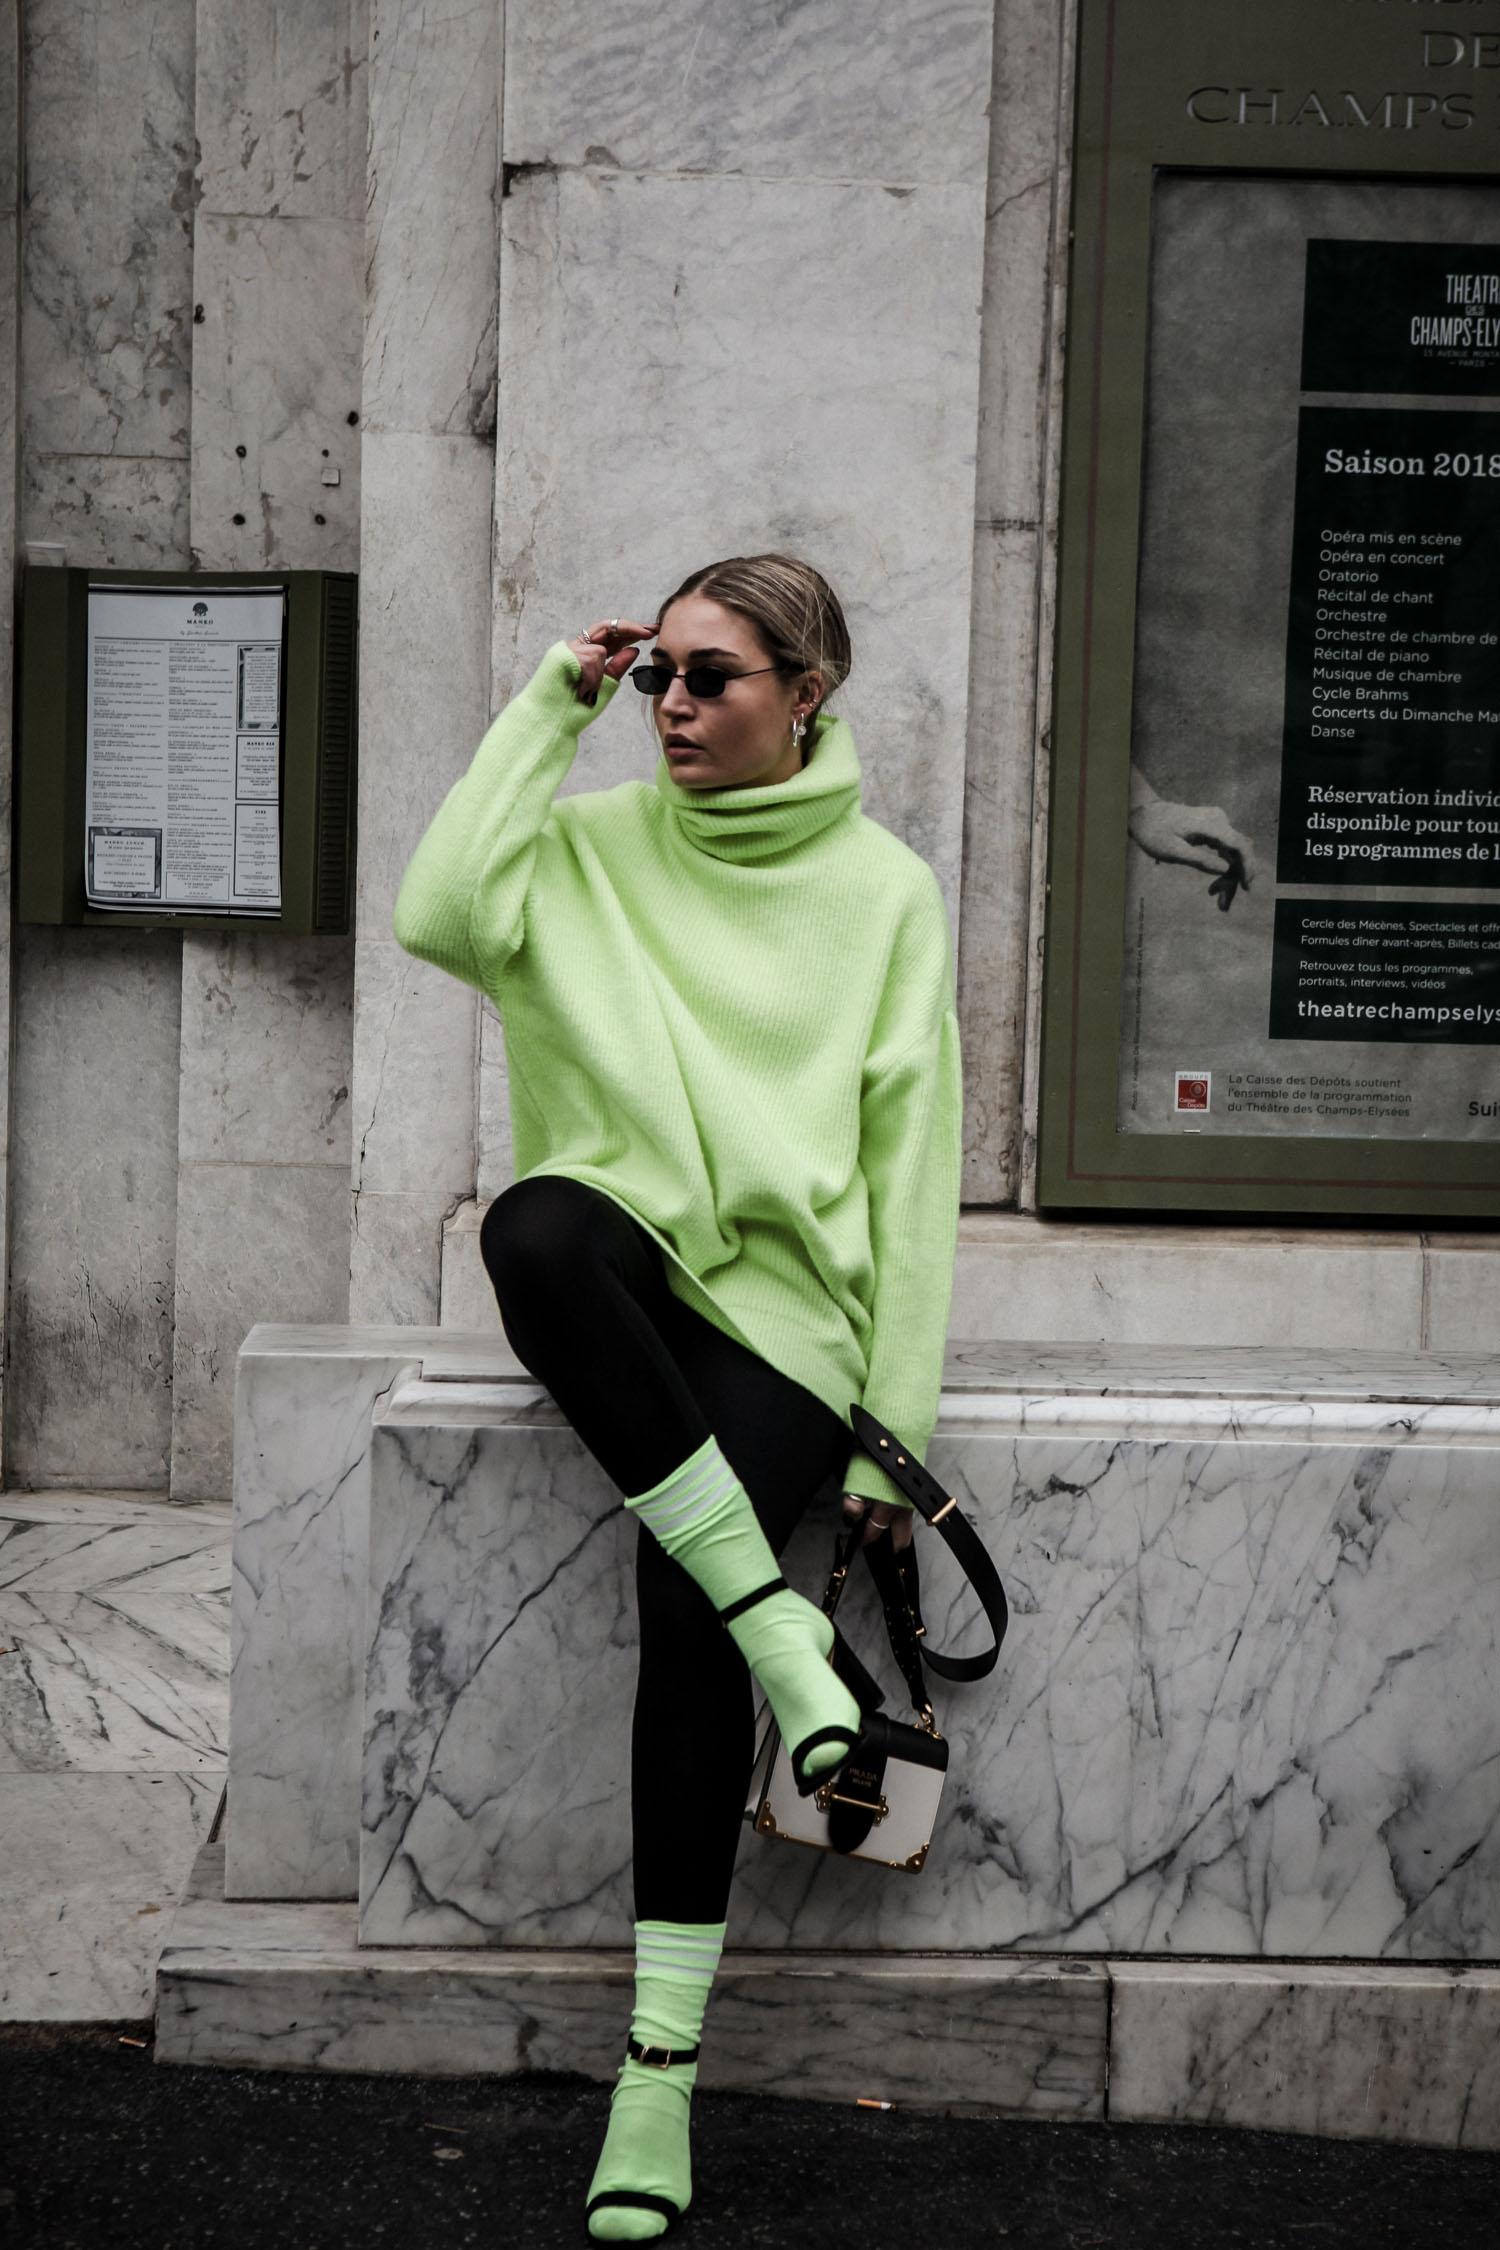 Lauralamode Blogger Fashion Mode Style Inspiration Fashionblogger Modeblogger Inspo Instagram Style Fashionblogger Berlin Neon Style Streetstyle Paris Prada Chiquelle Munich